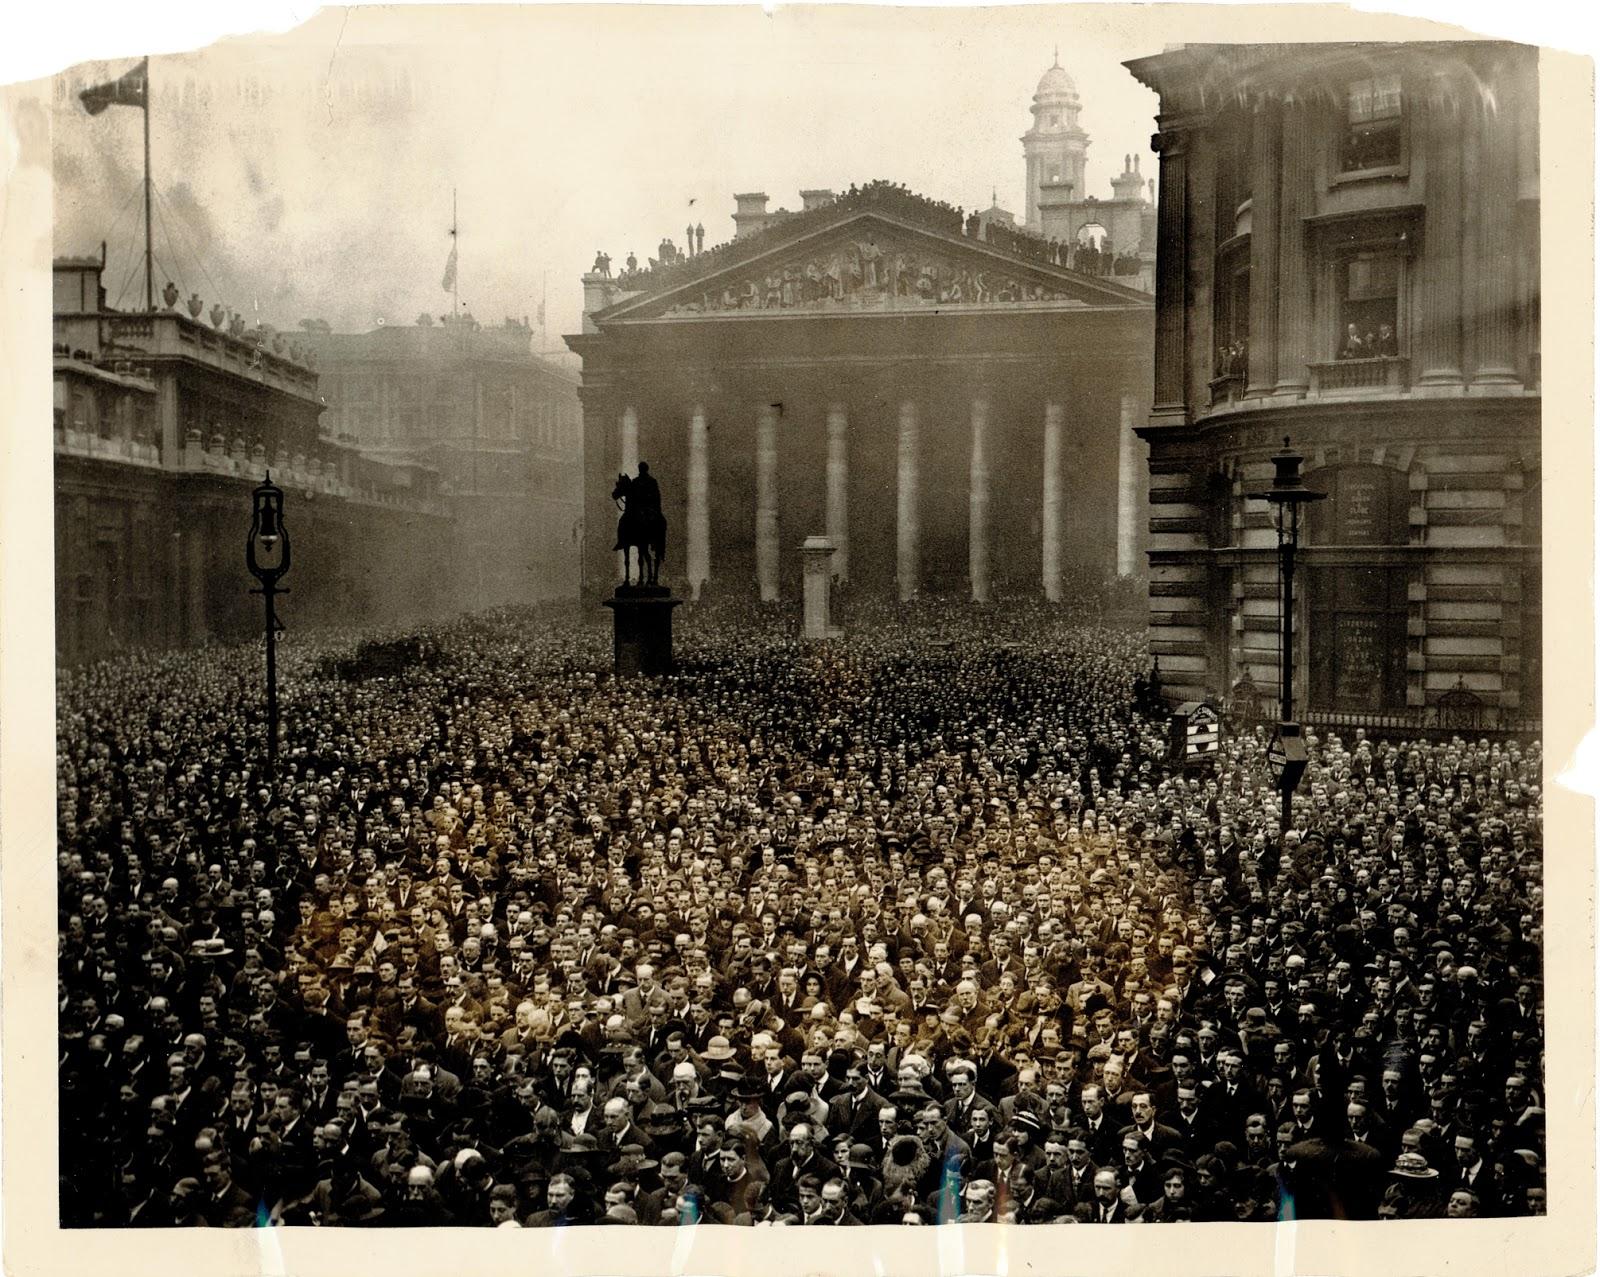 Ancestral Discoveries: 1921 Armistice Day Commemoration